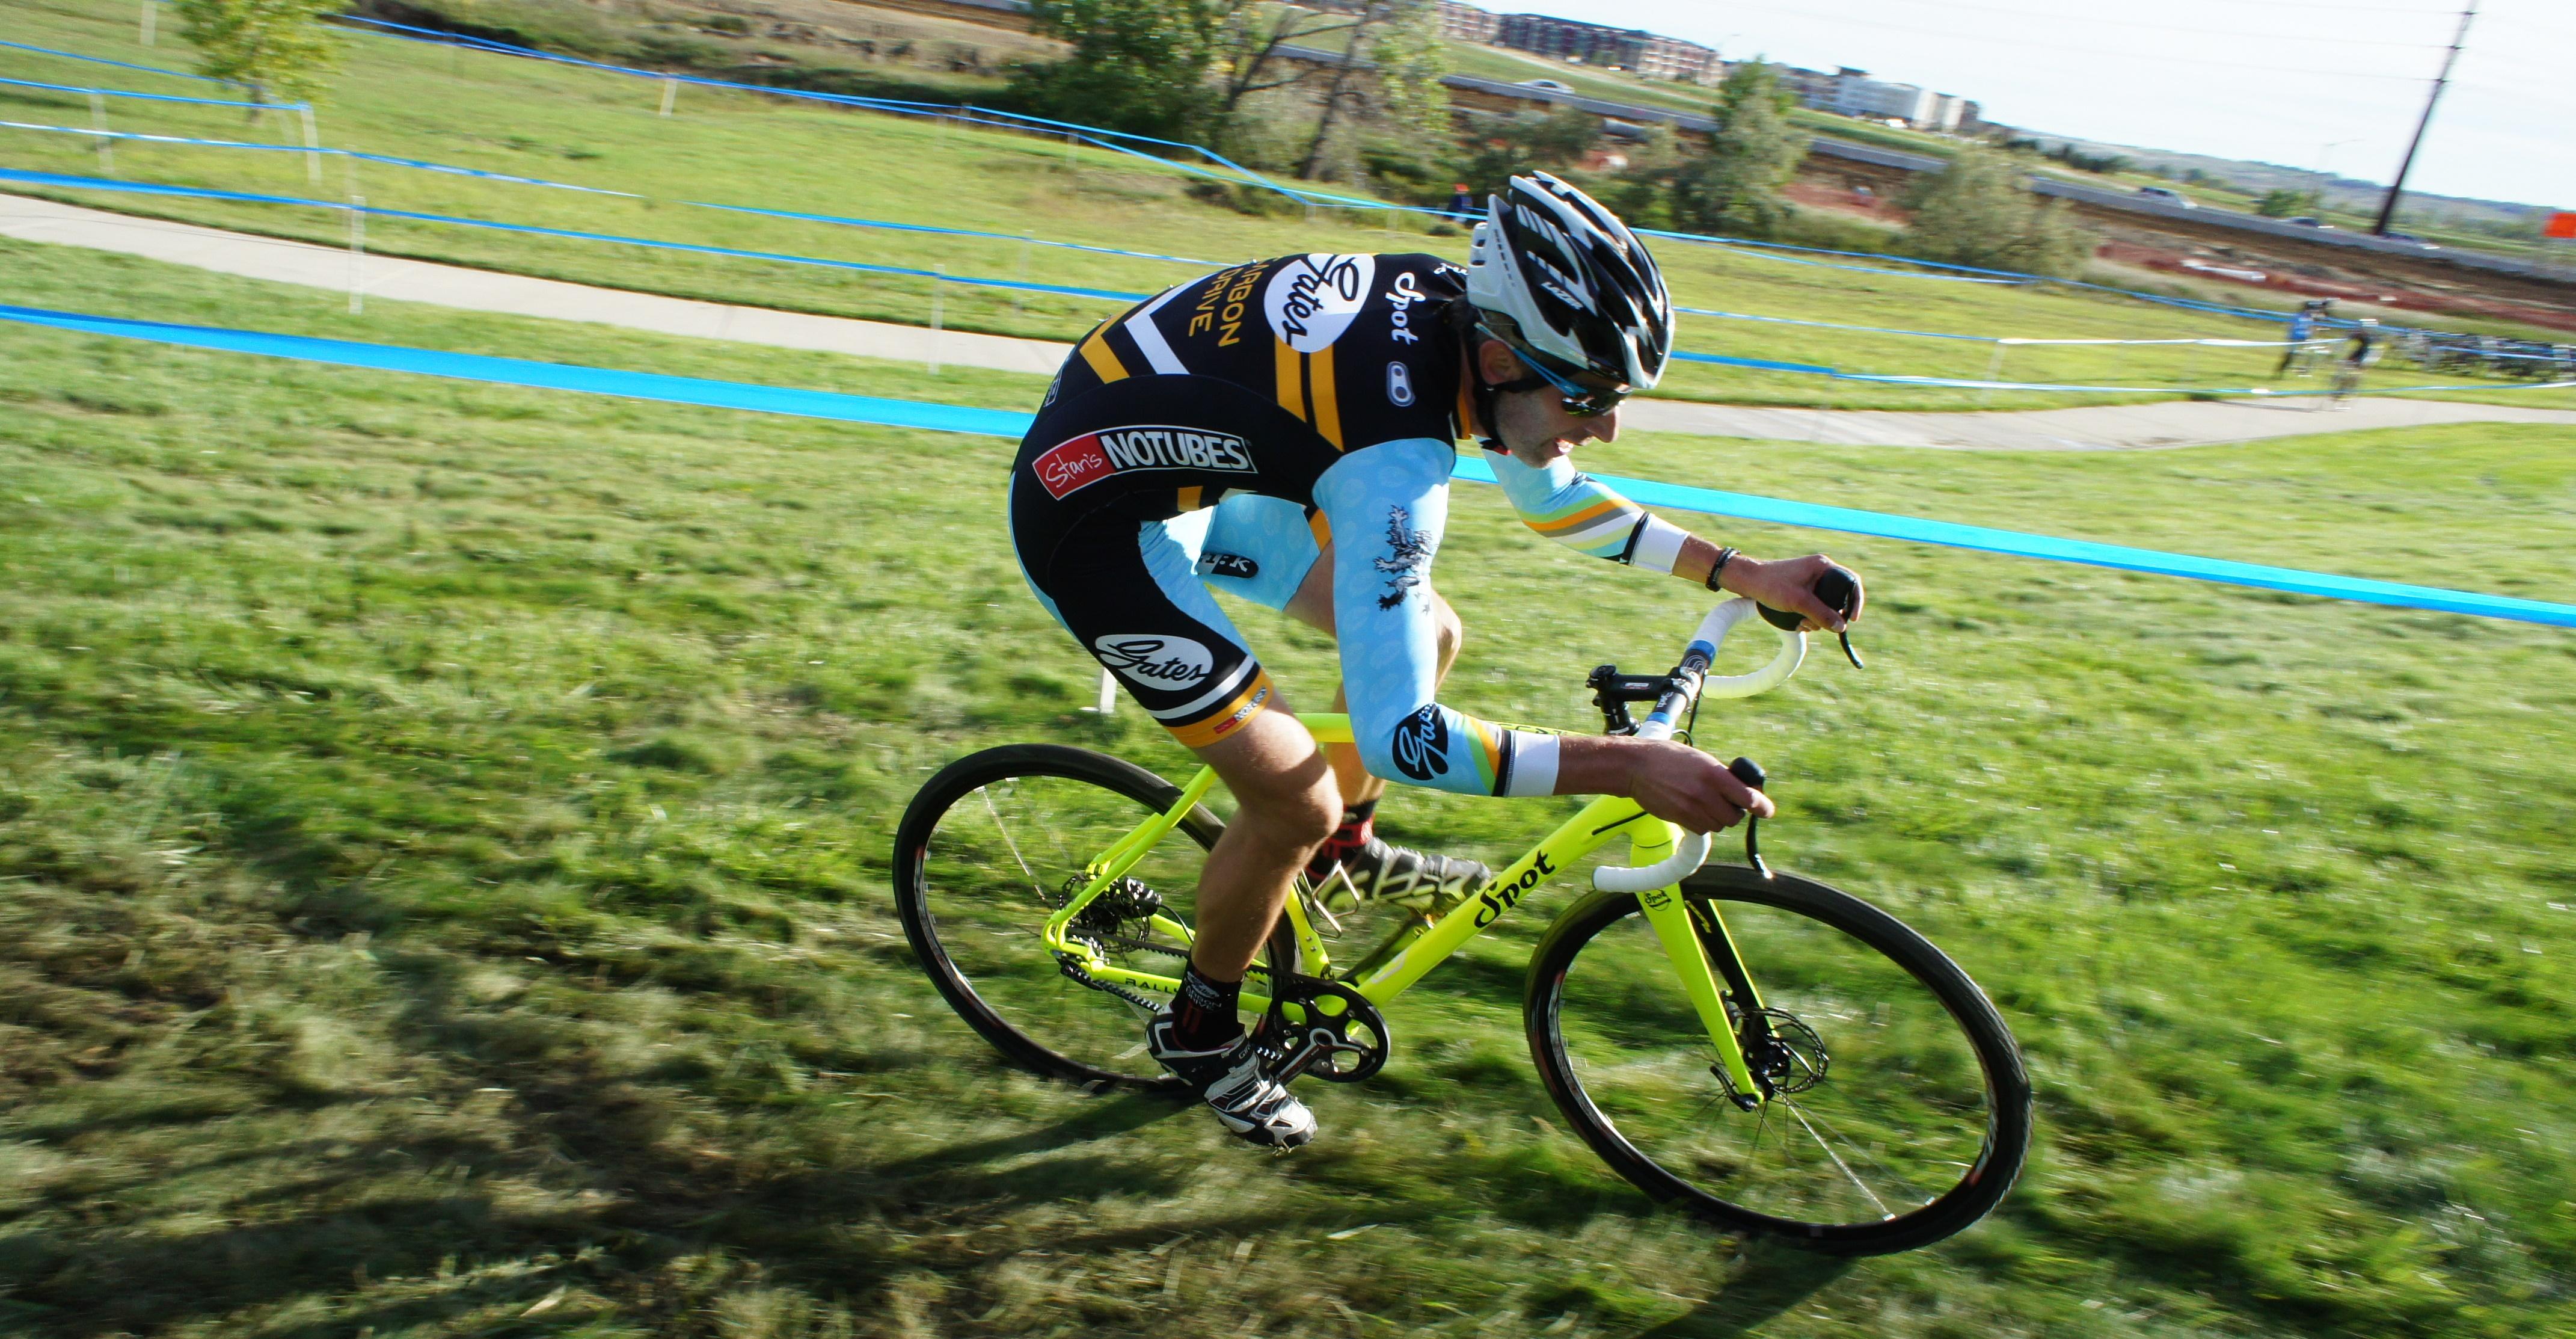 Derek Strong rails a slick grassy corner.